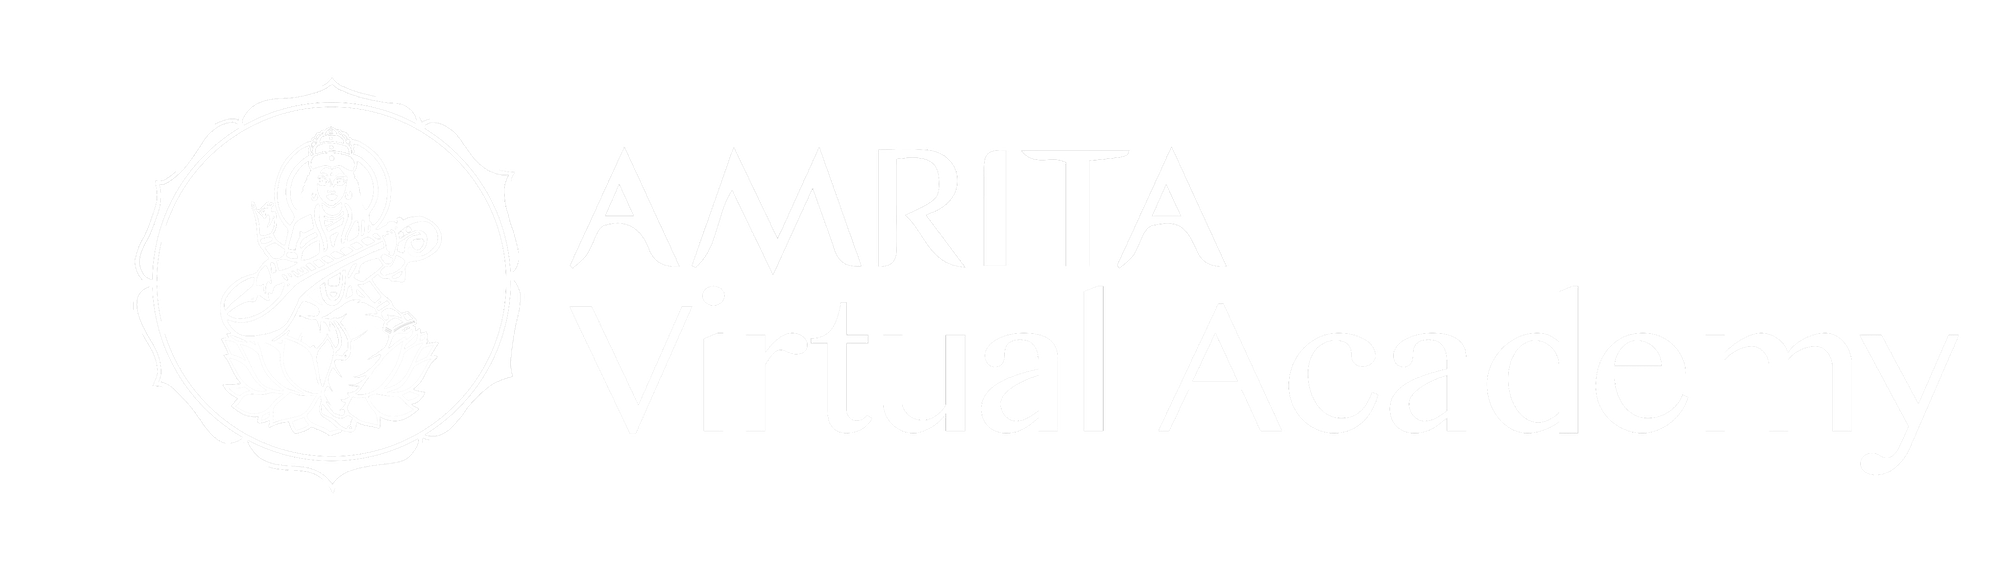 Amrita Virtual Academy